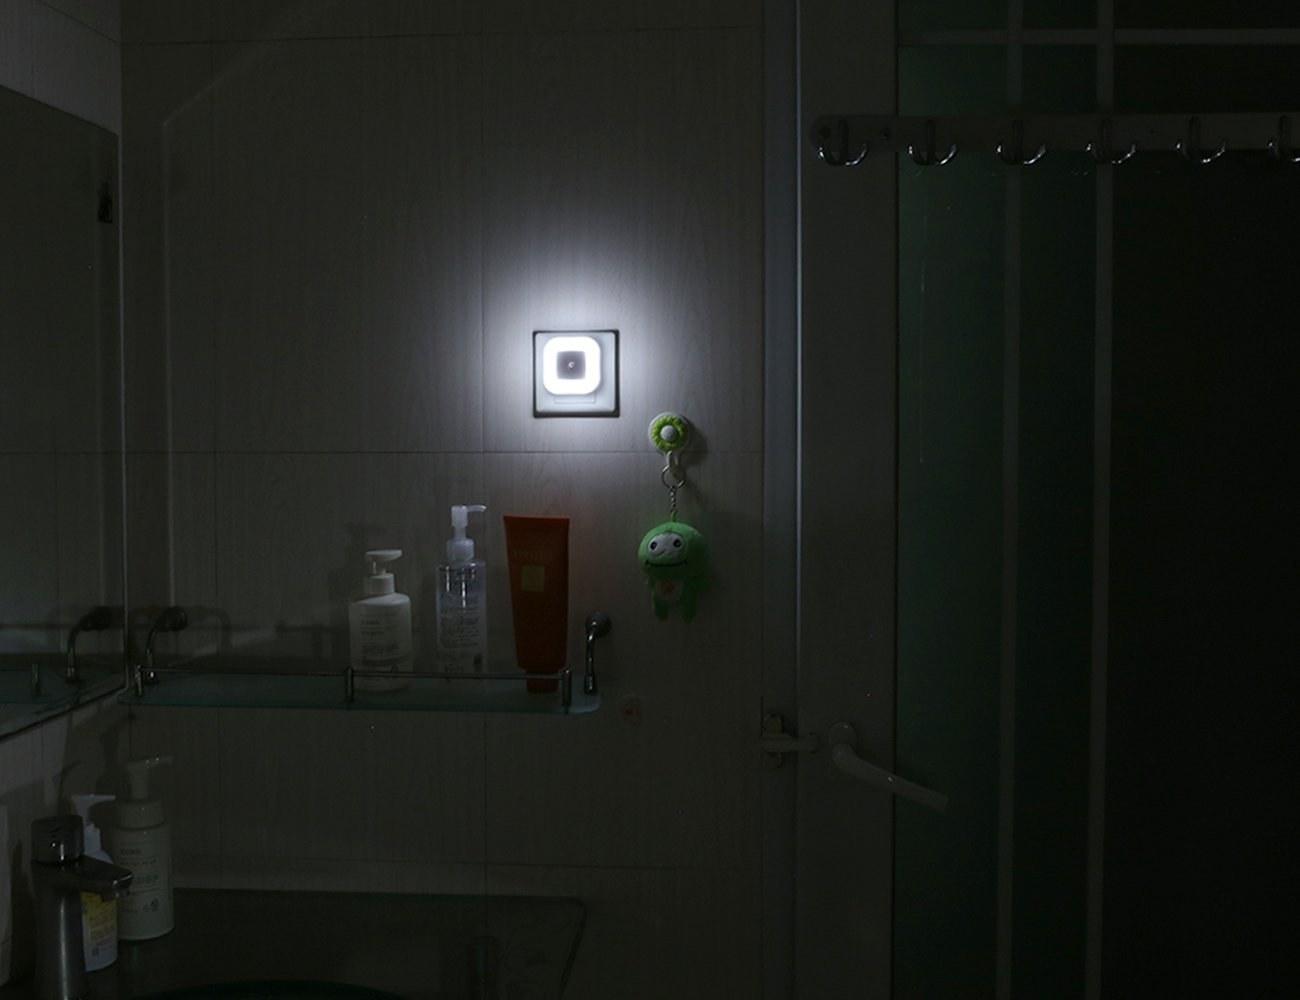 LED plug-in night light